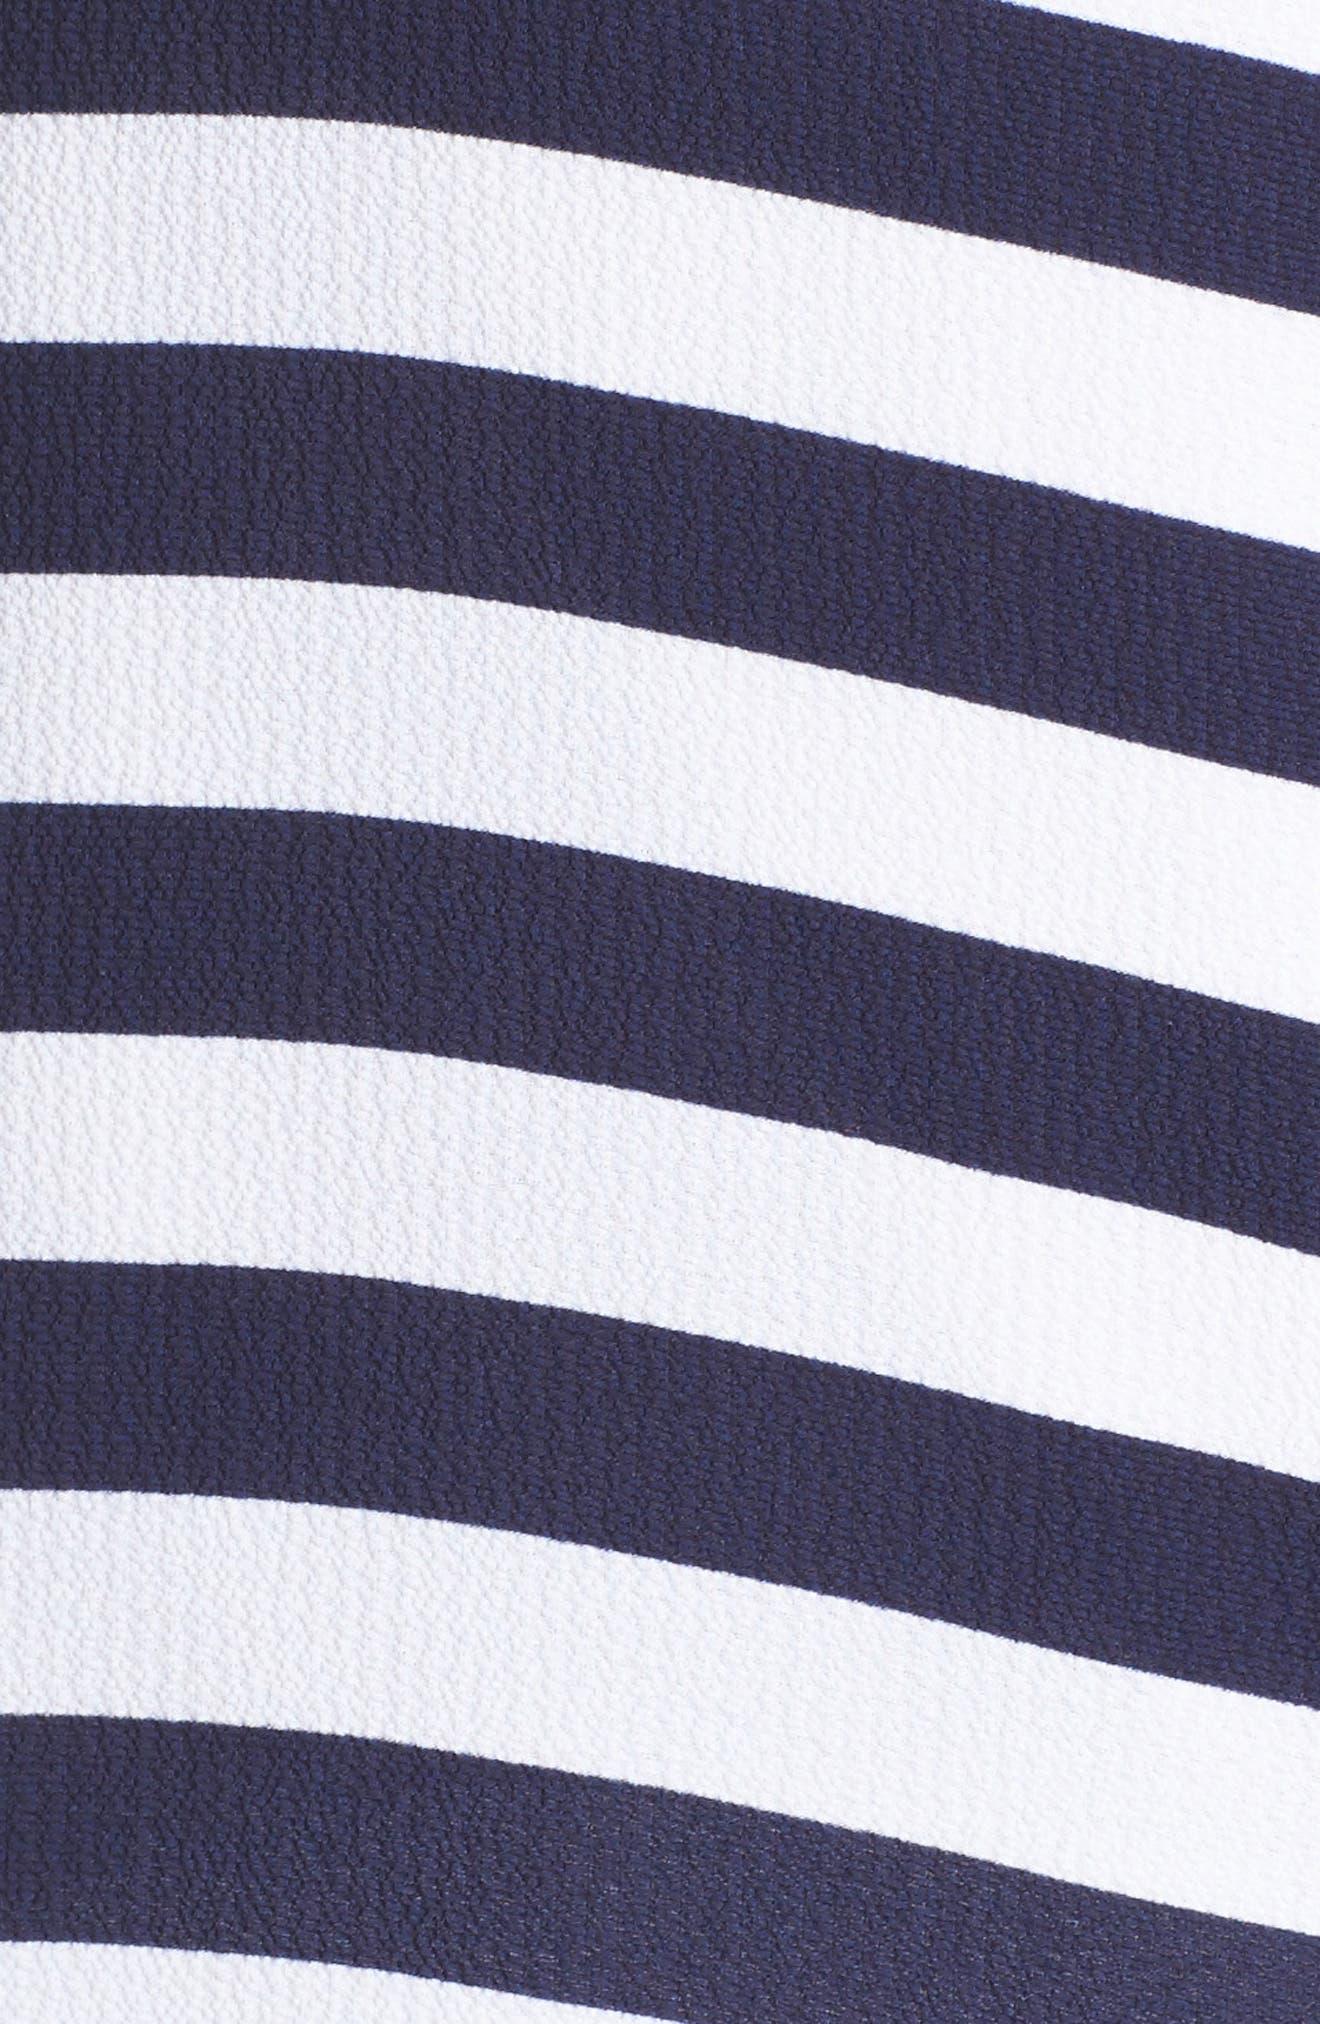 Stripe Side Tie Top,                             Alternate thumbnail 5, color,                             True Navy